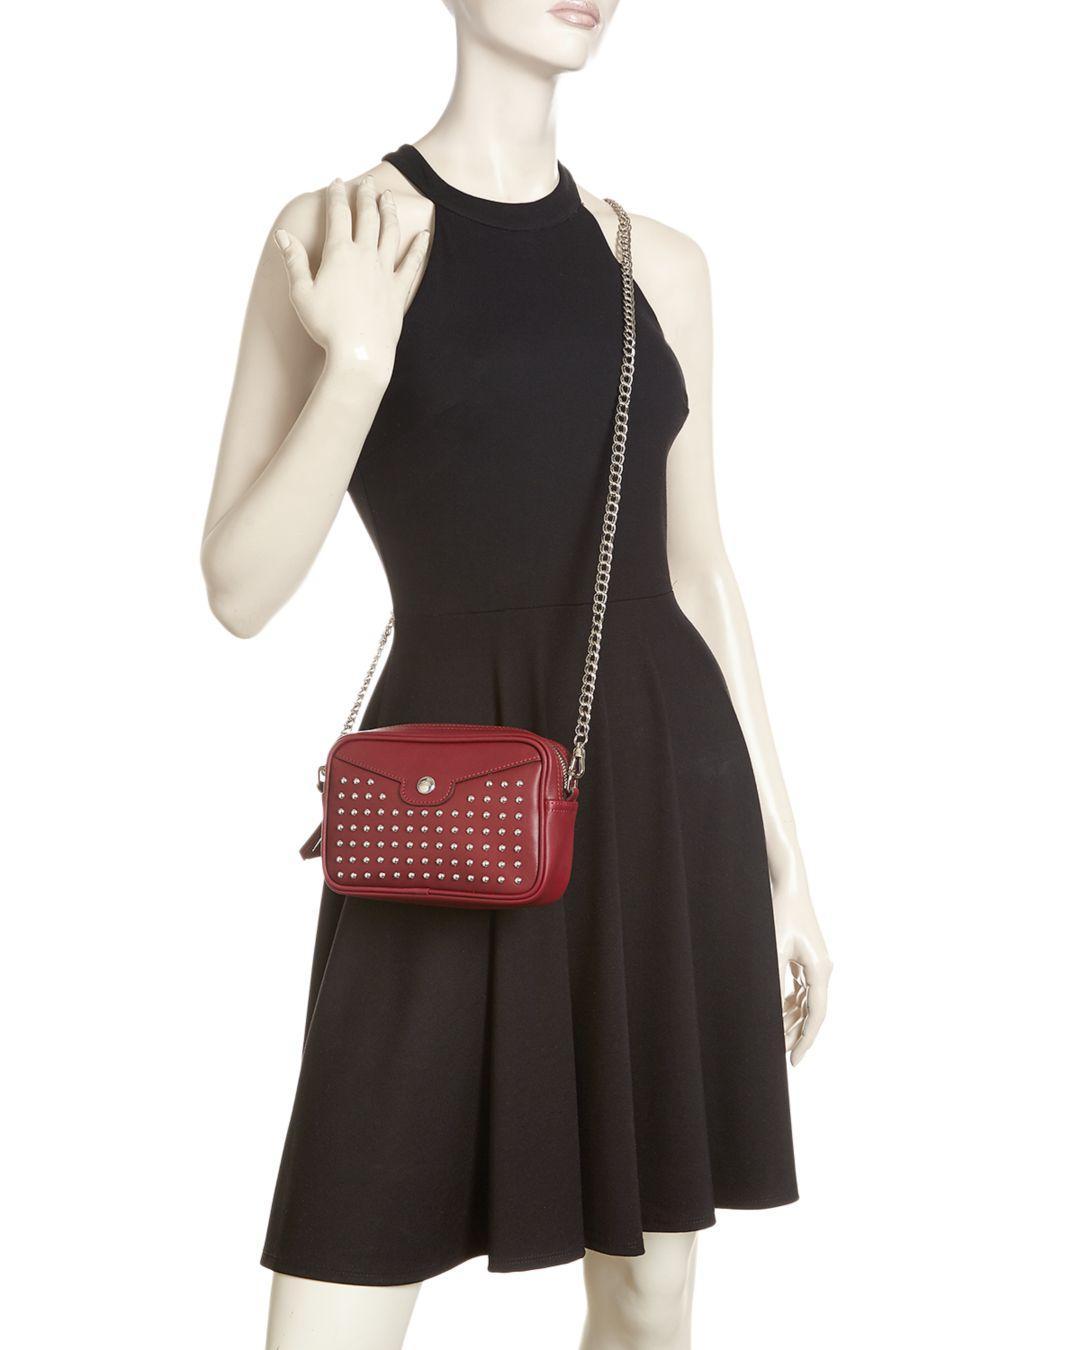 Mademoiselle Rock Studded Leather Crossbody